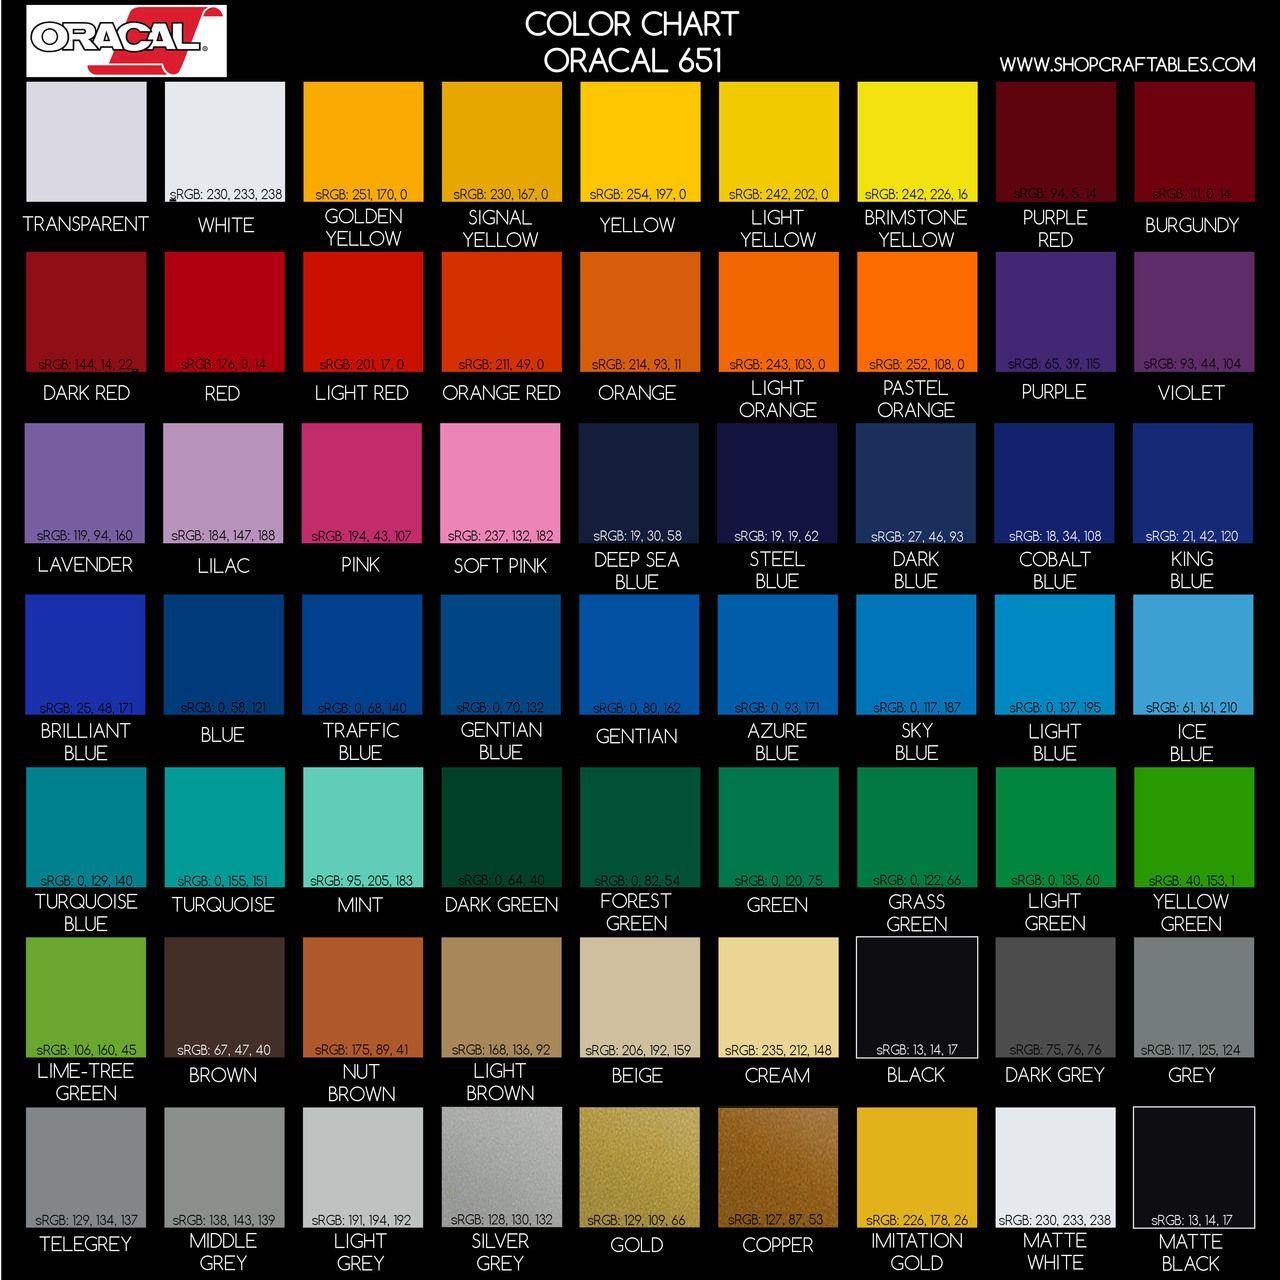 Oracal 651 Sheets By Color 12 X12 Single Sheet And Bulk Packs Shop Craftables Vinyl Rolls Vinyl Cricut Vinyl